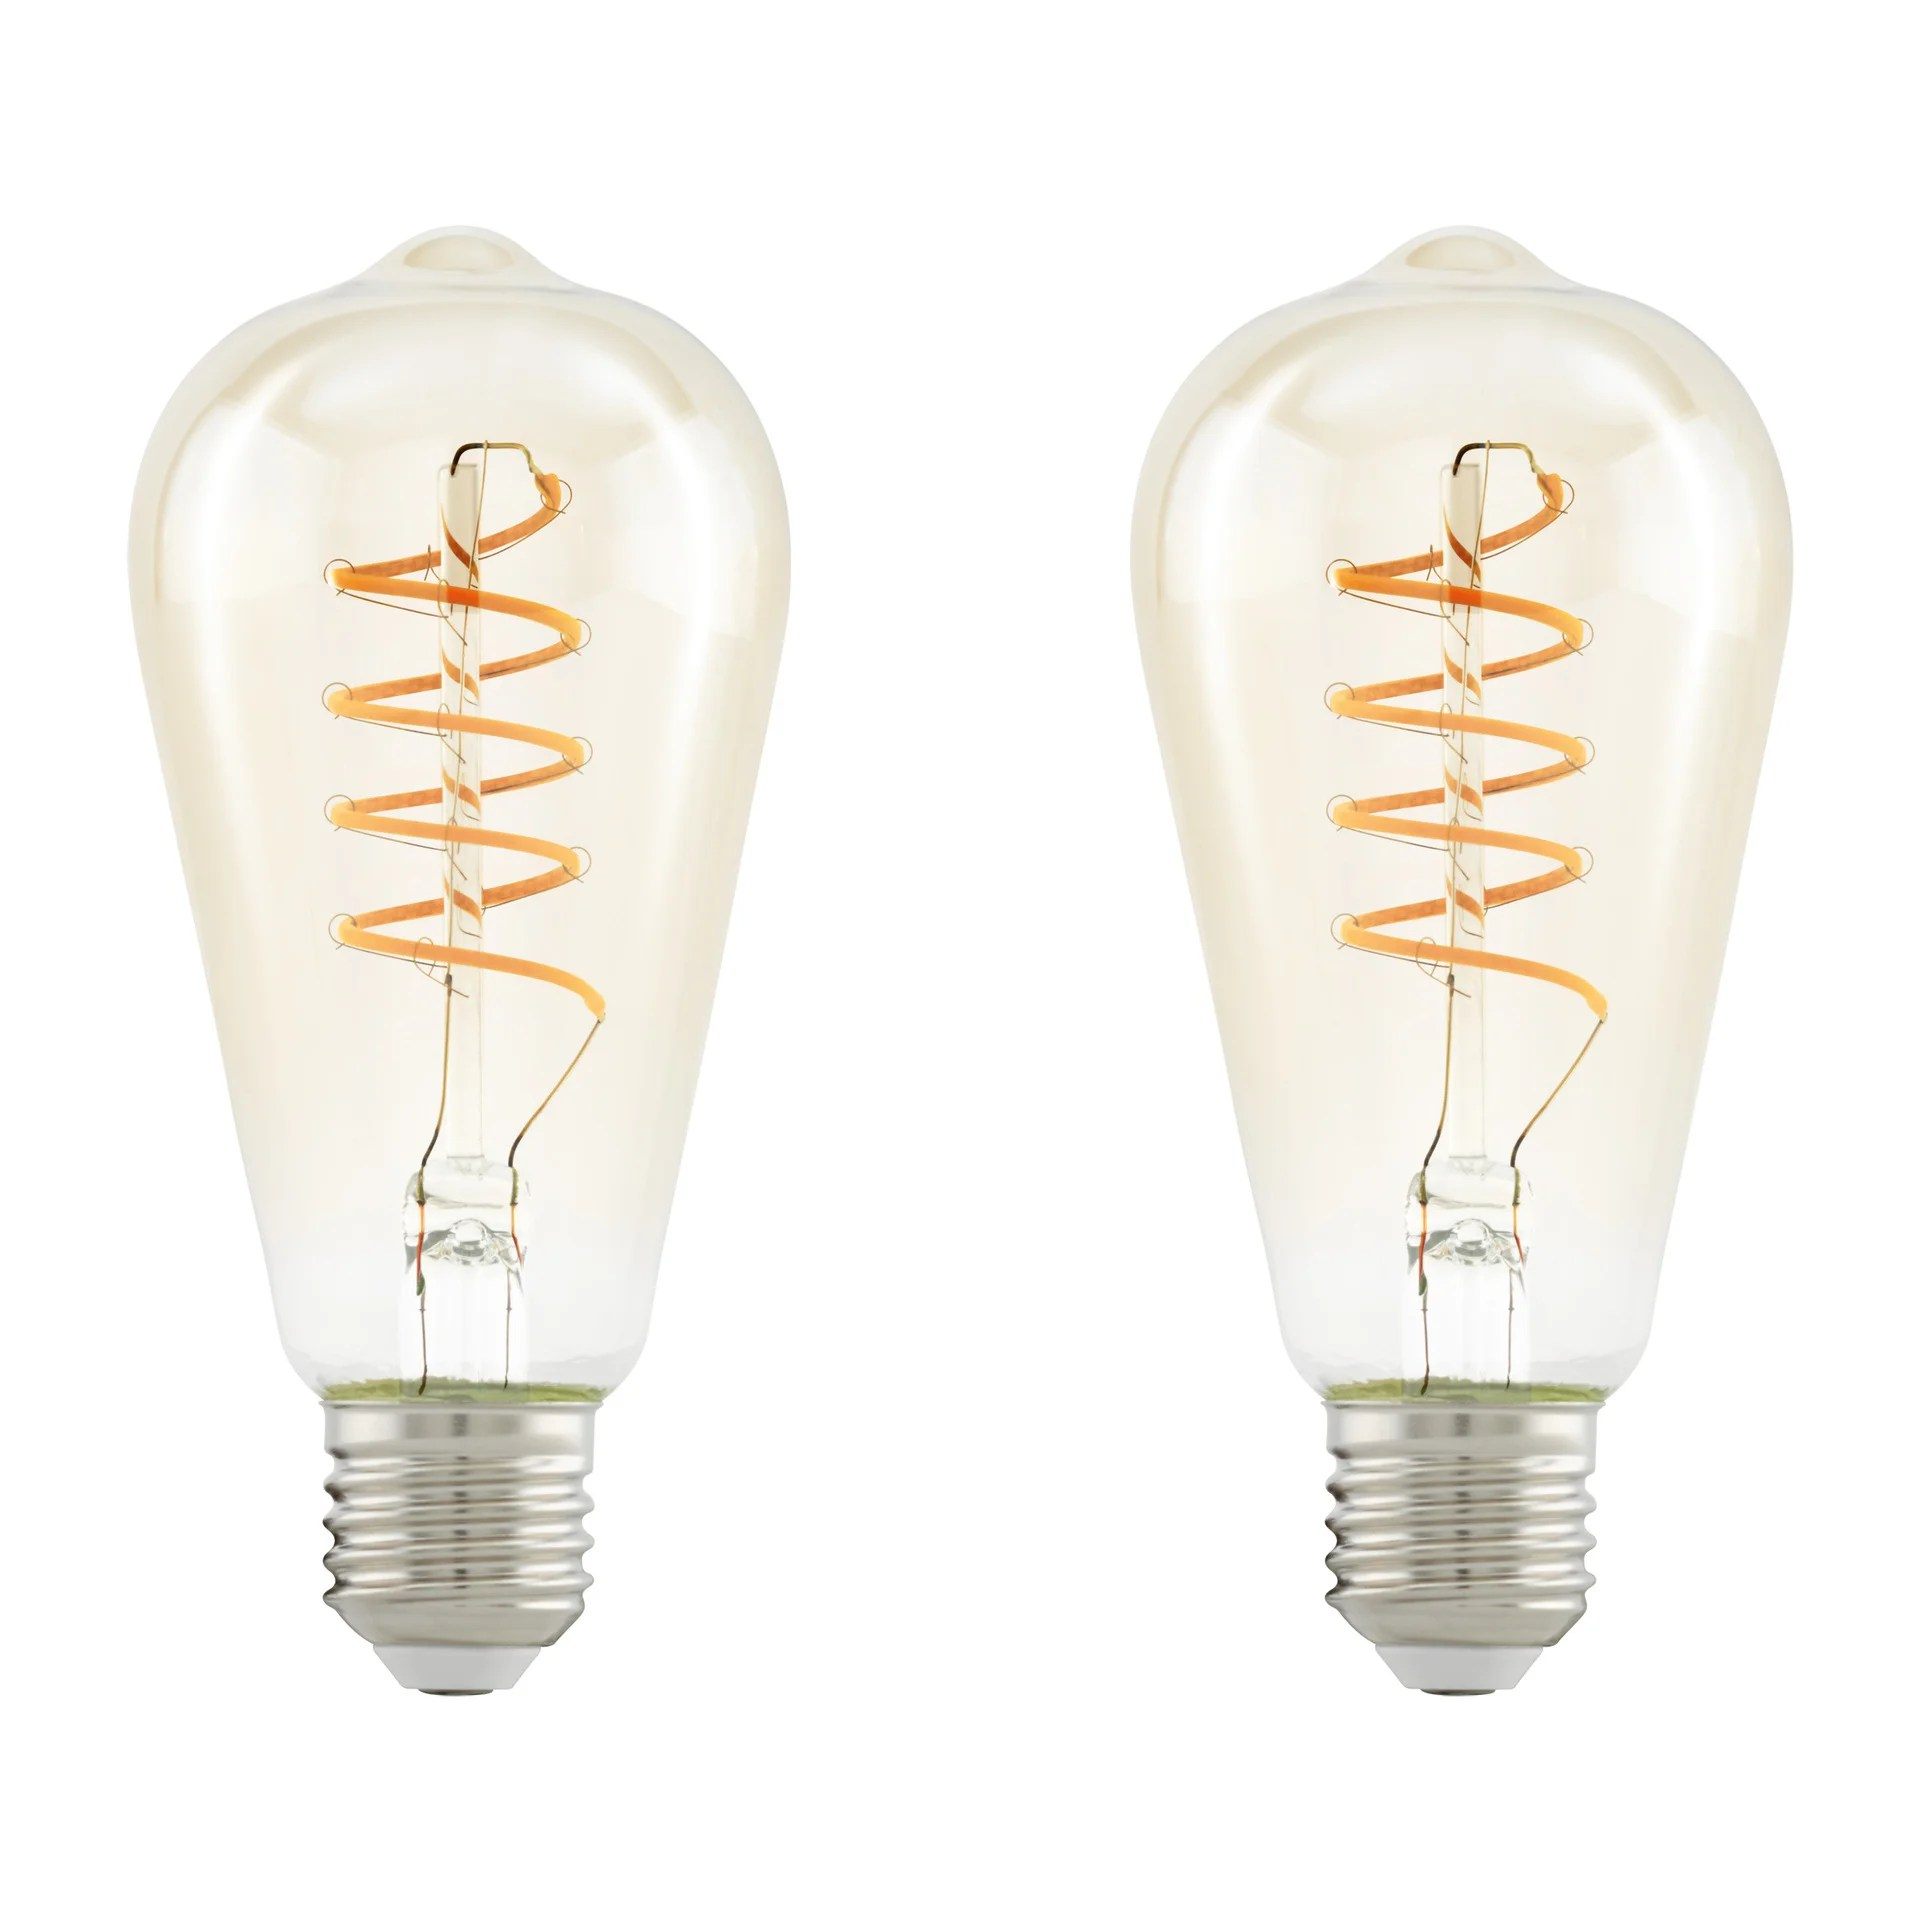 Ampoule Decorative Led Or Globe 95 Mm E27 600 Lm 5 5 W Blanc Chaud Lexman Leroy Merlin